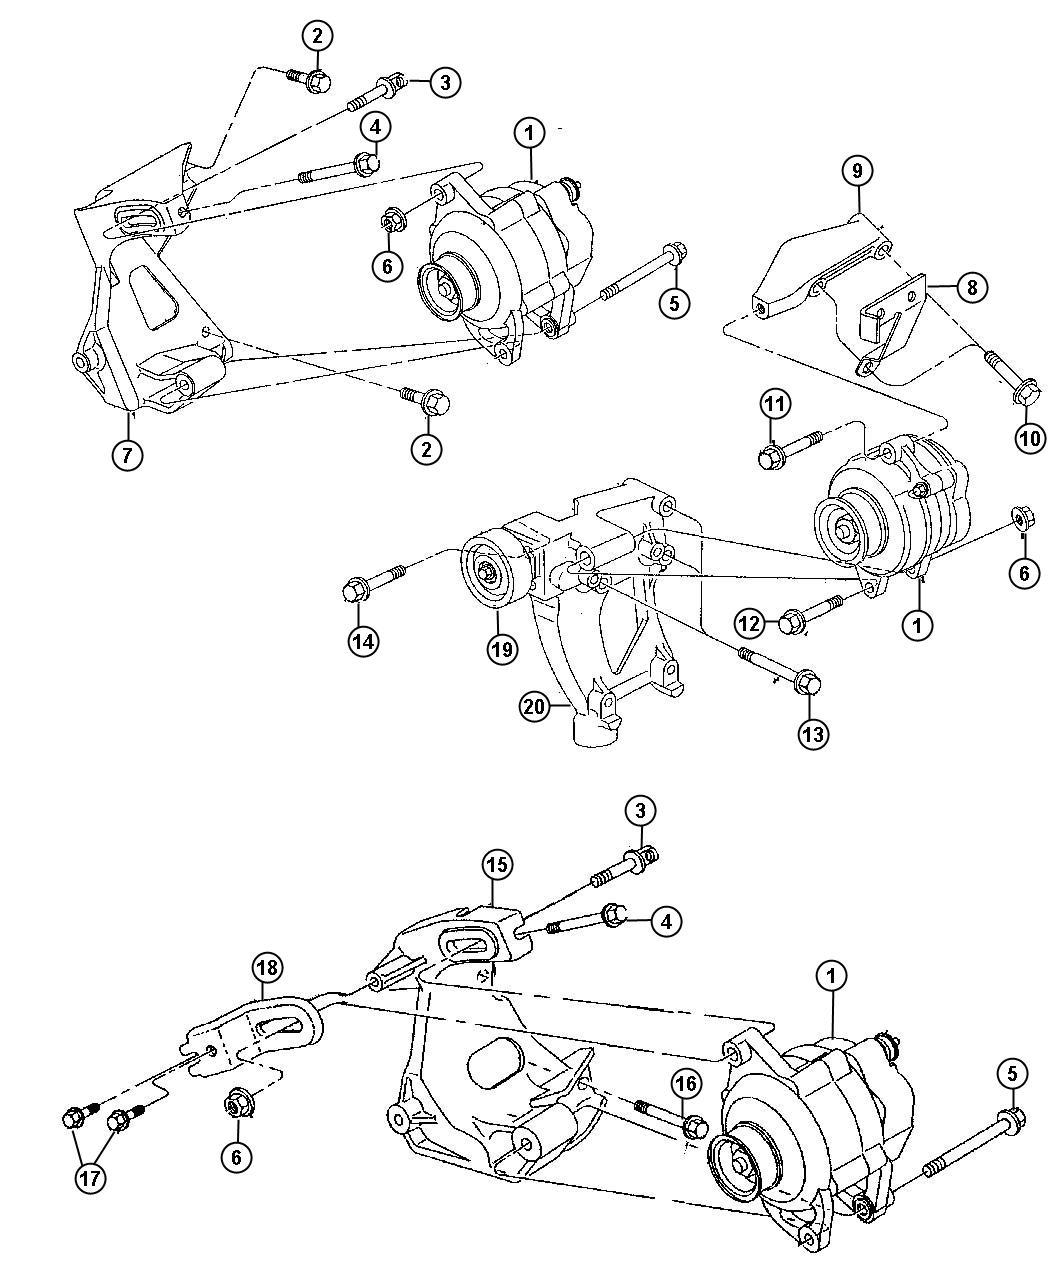 Alternator Components Diagram, Alternator, Free Engine